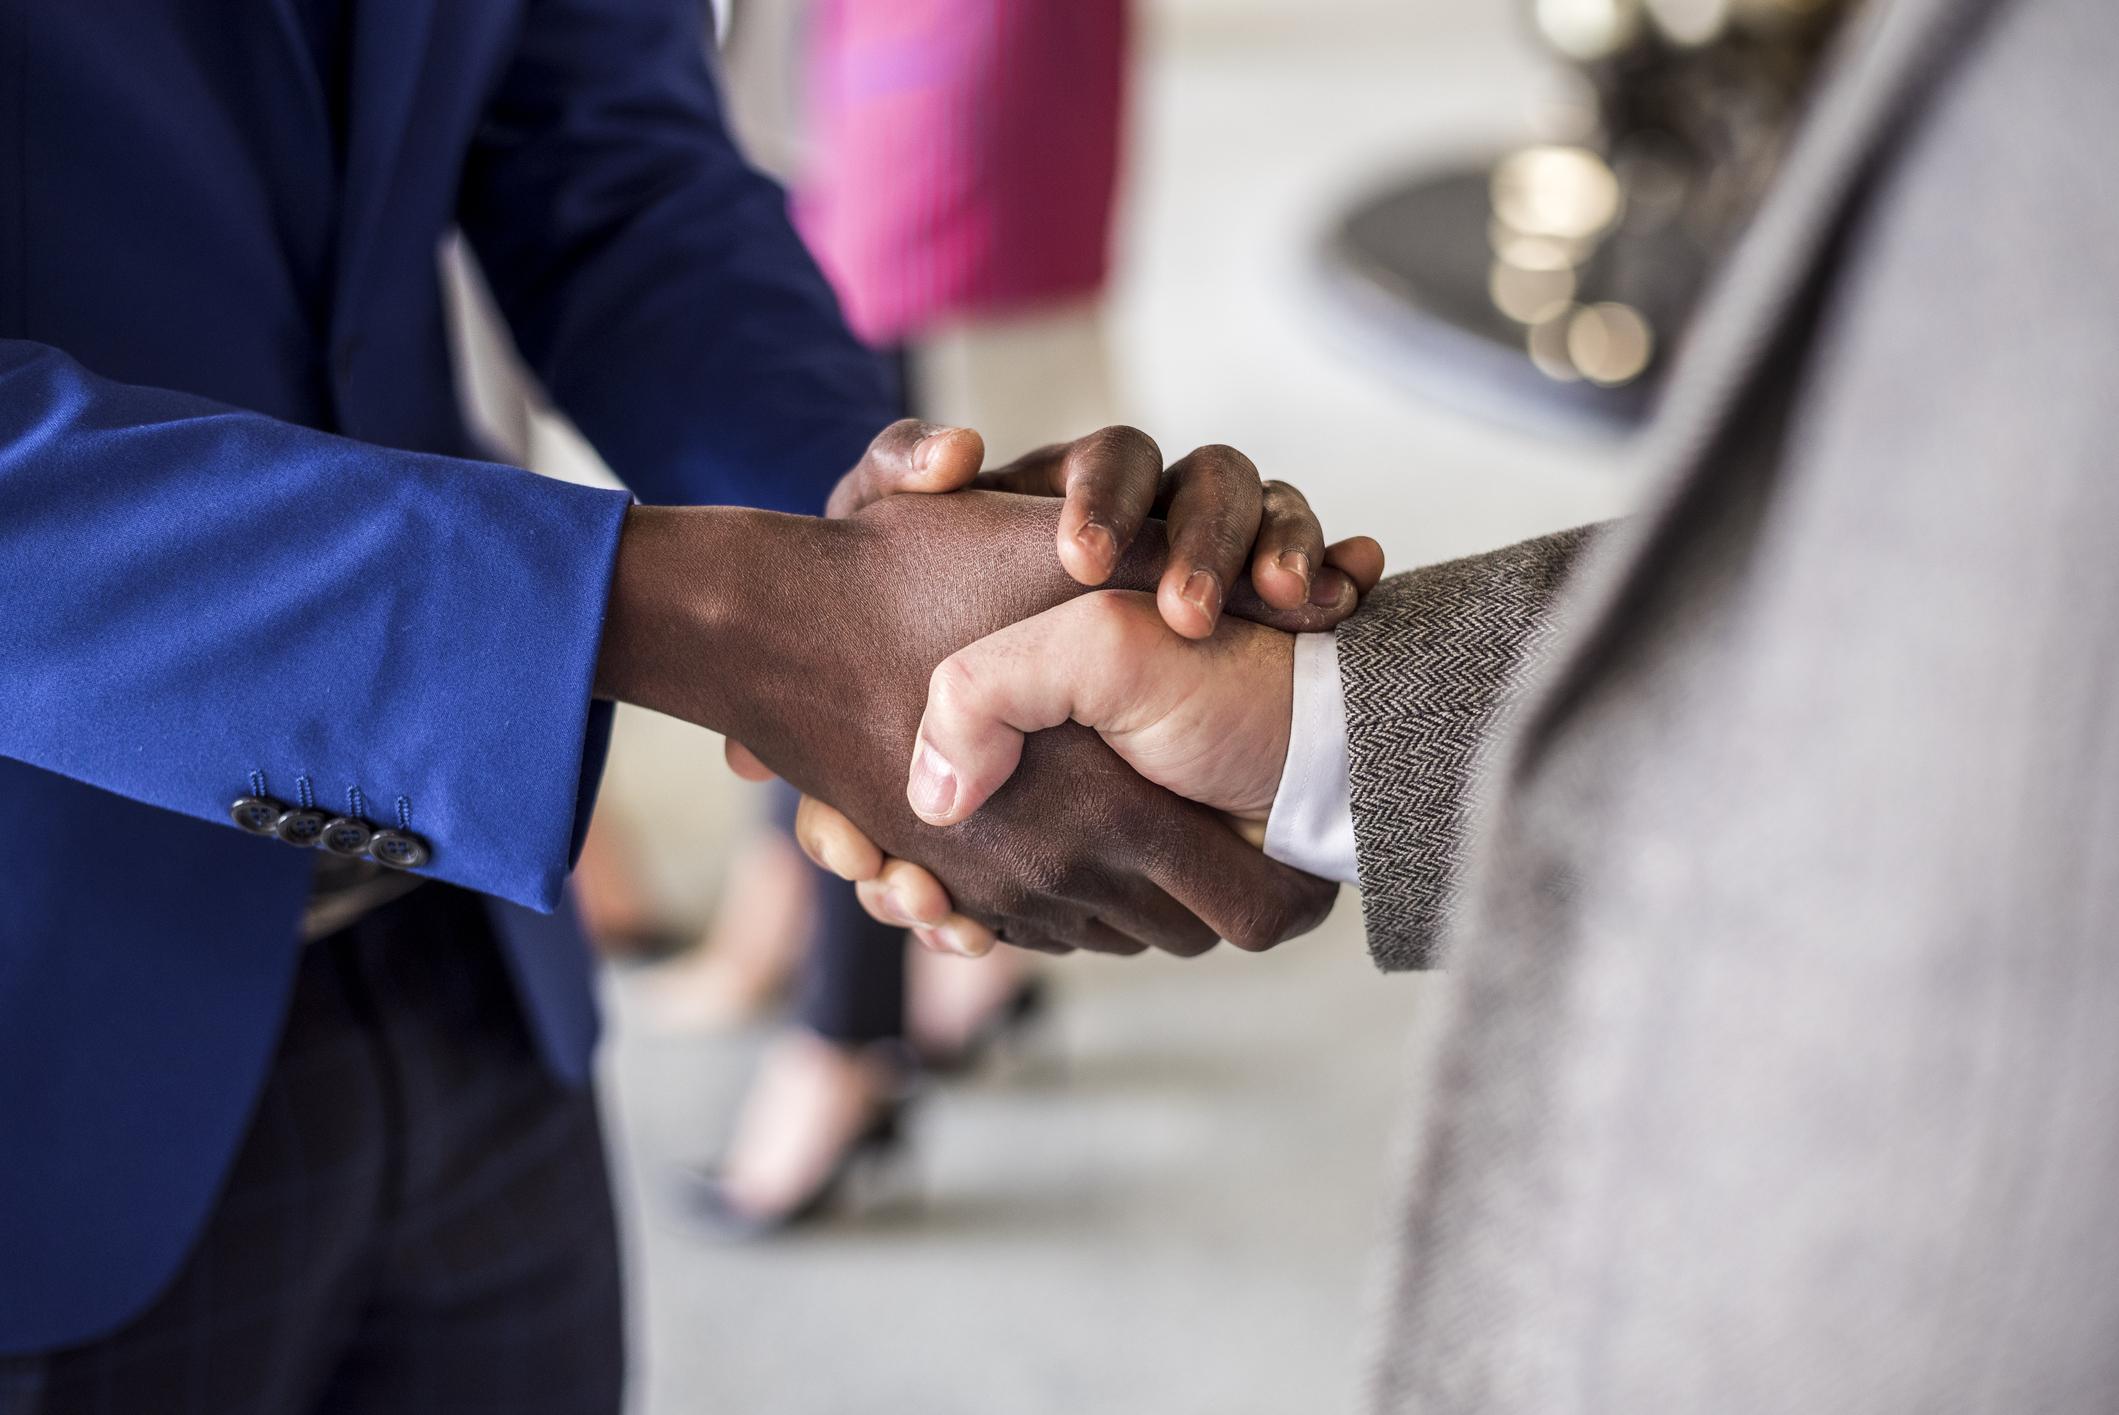 Stock photo of a handshake